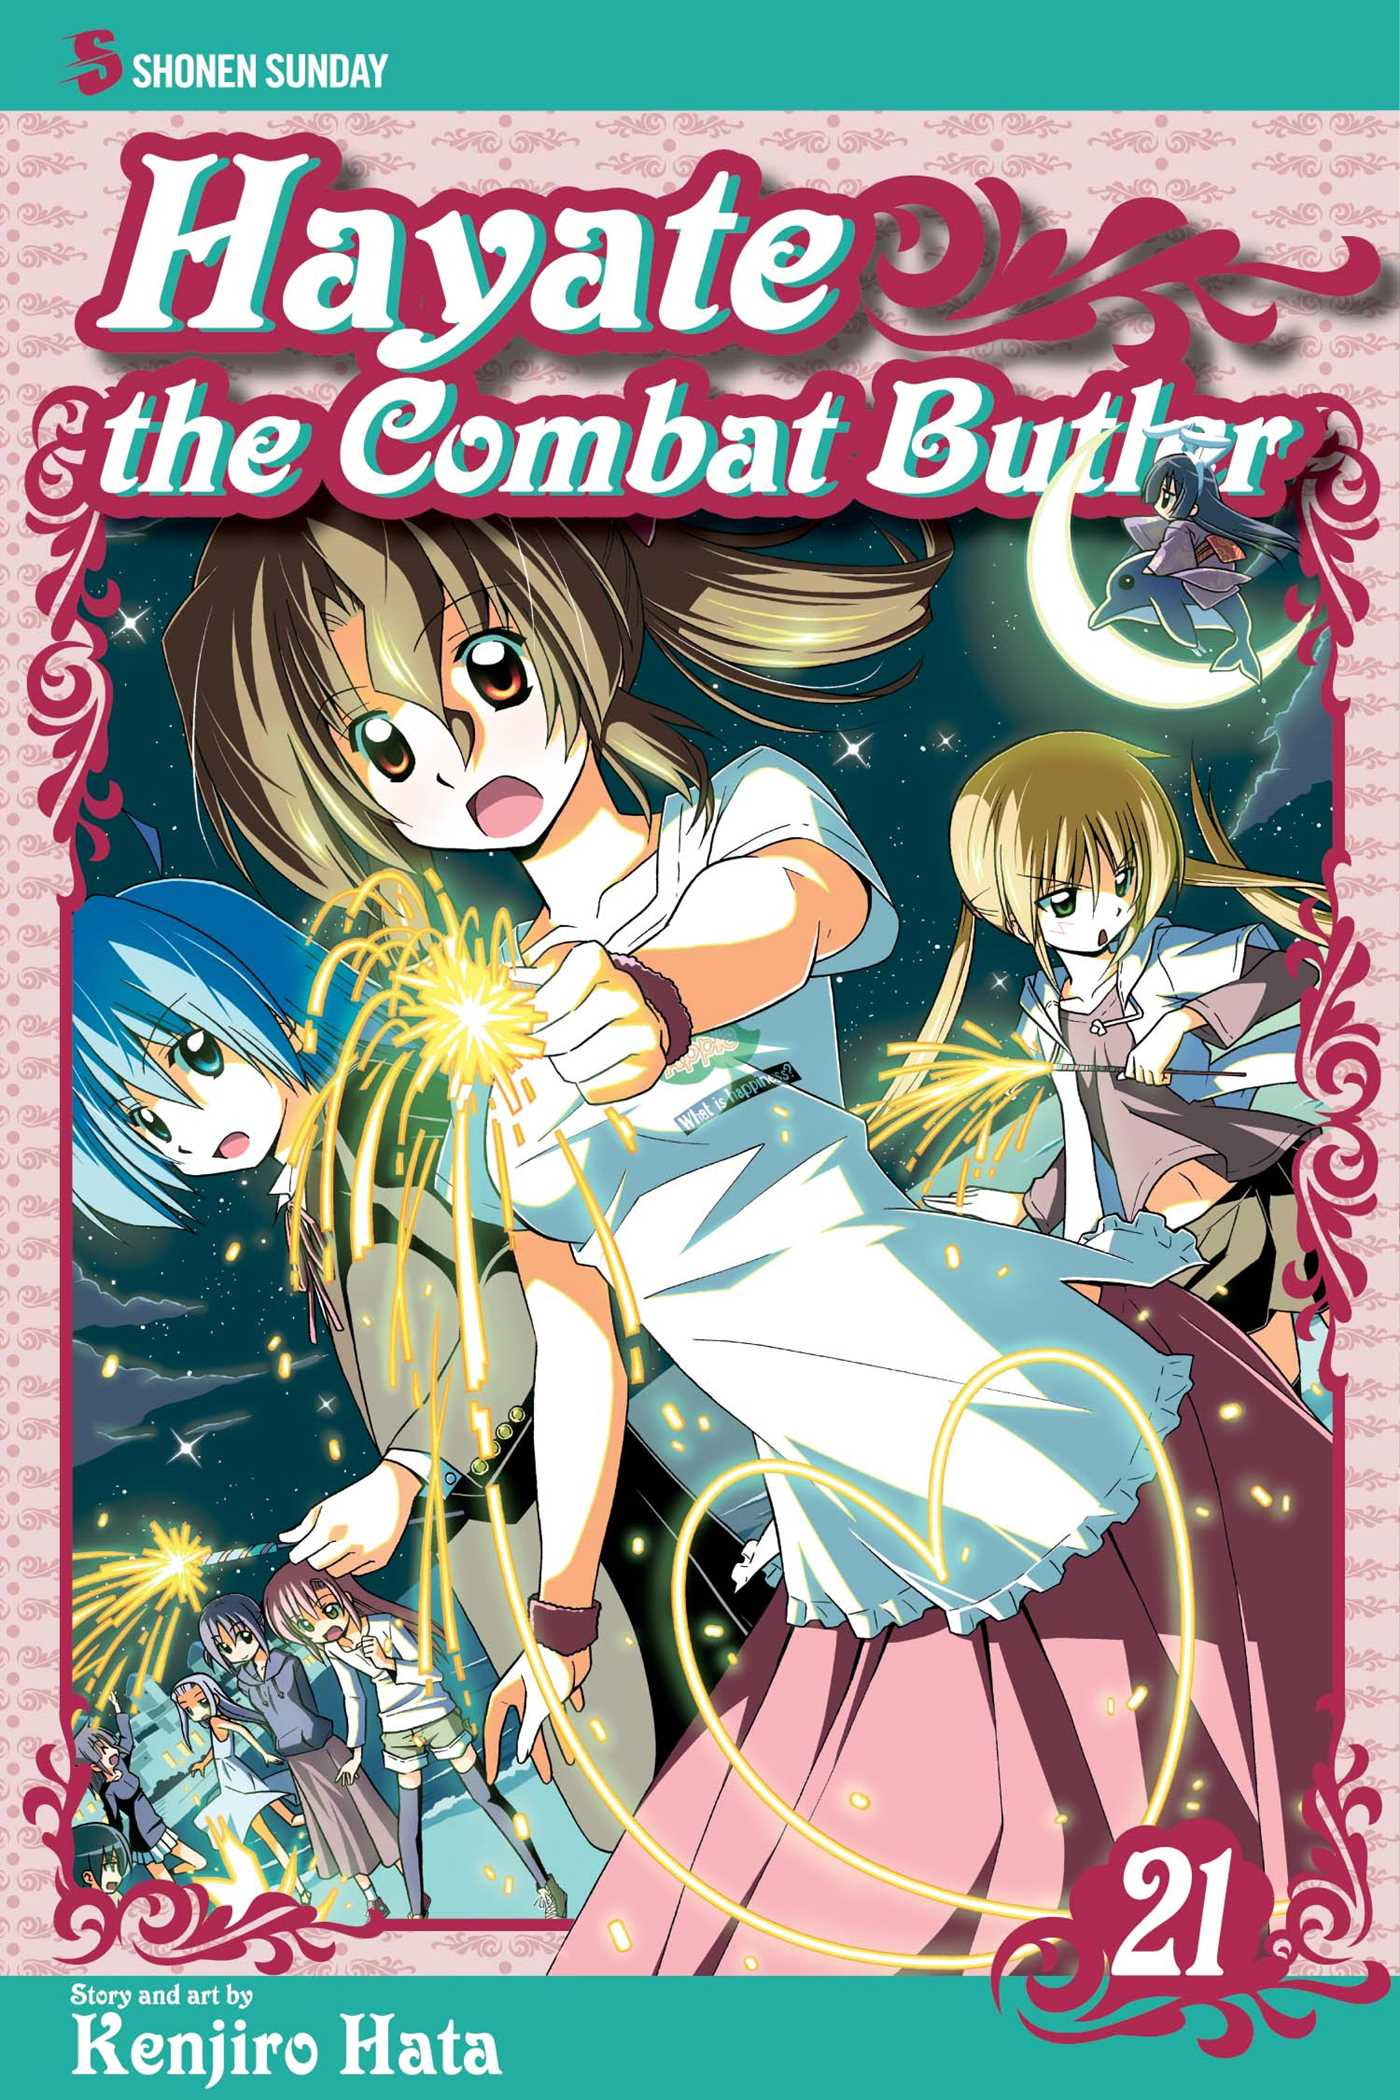 Hayate The Combat Butler Backgrounds on Wallpapers Vista